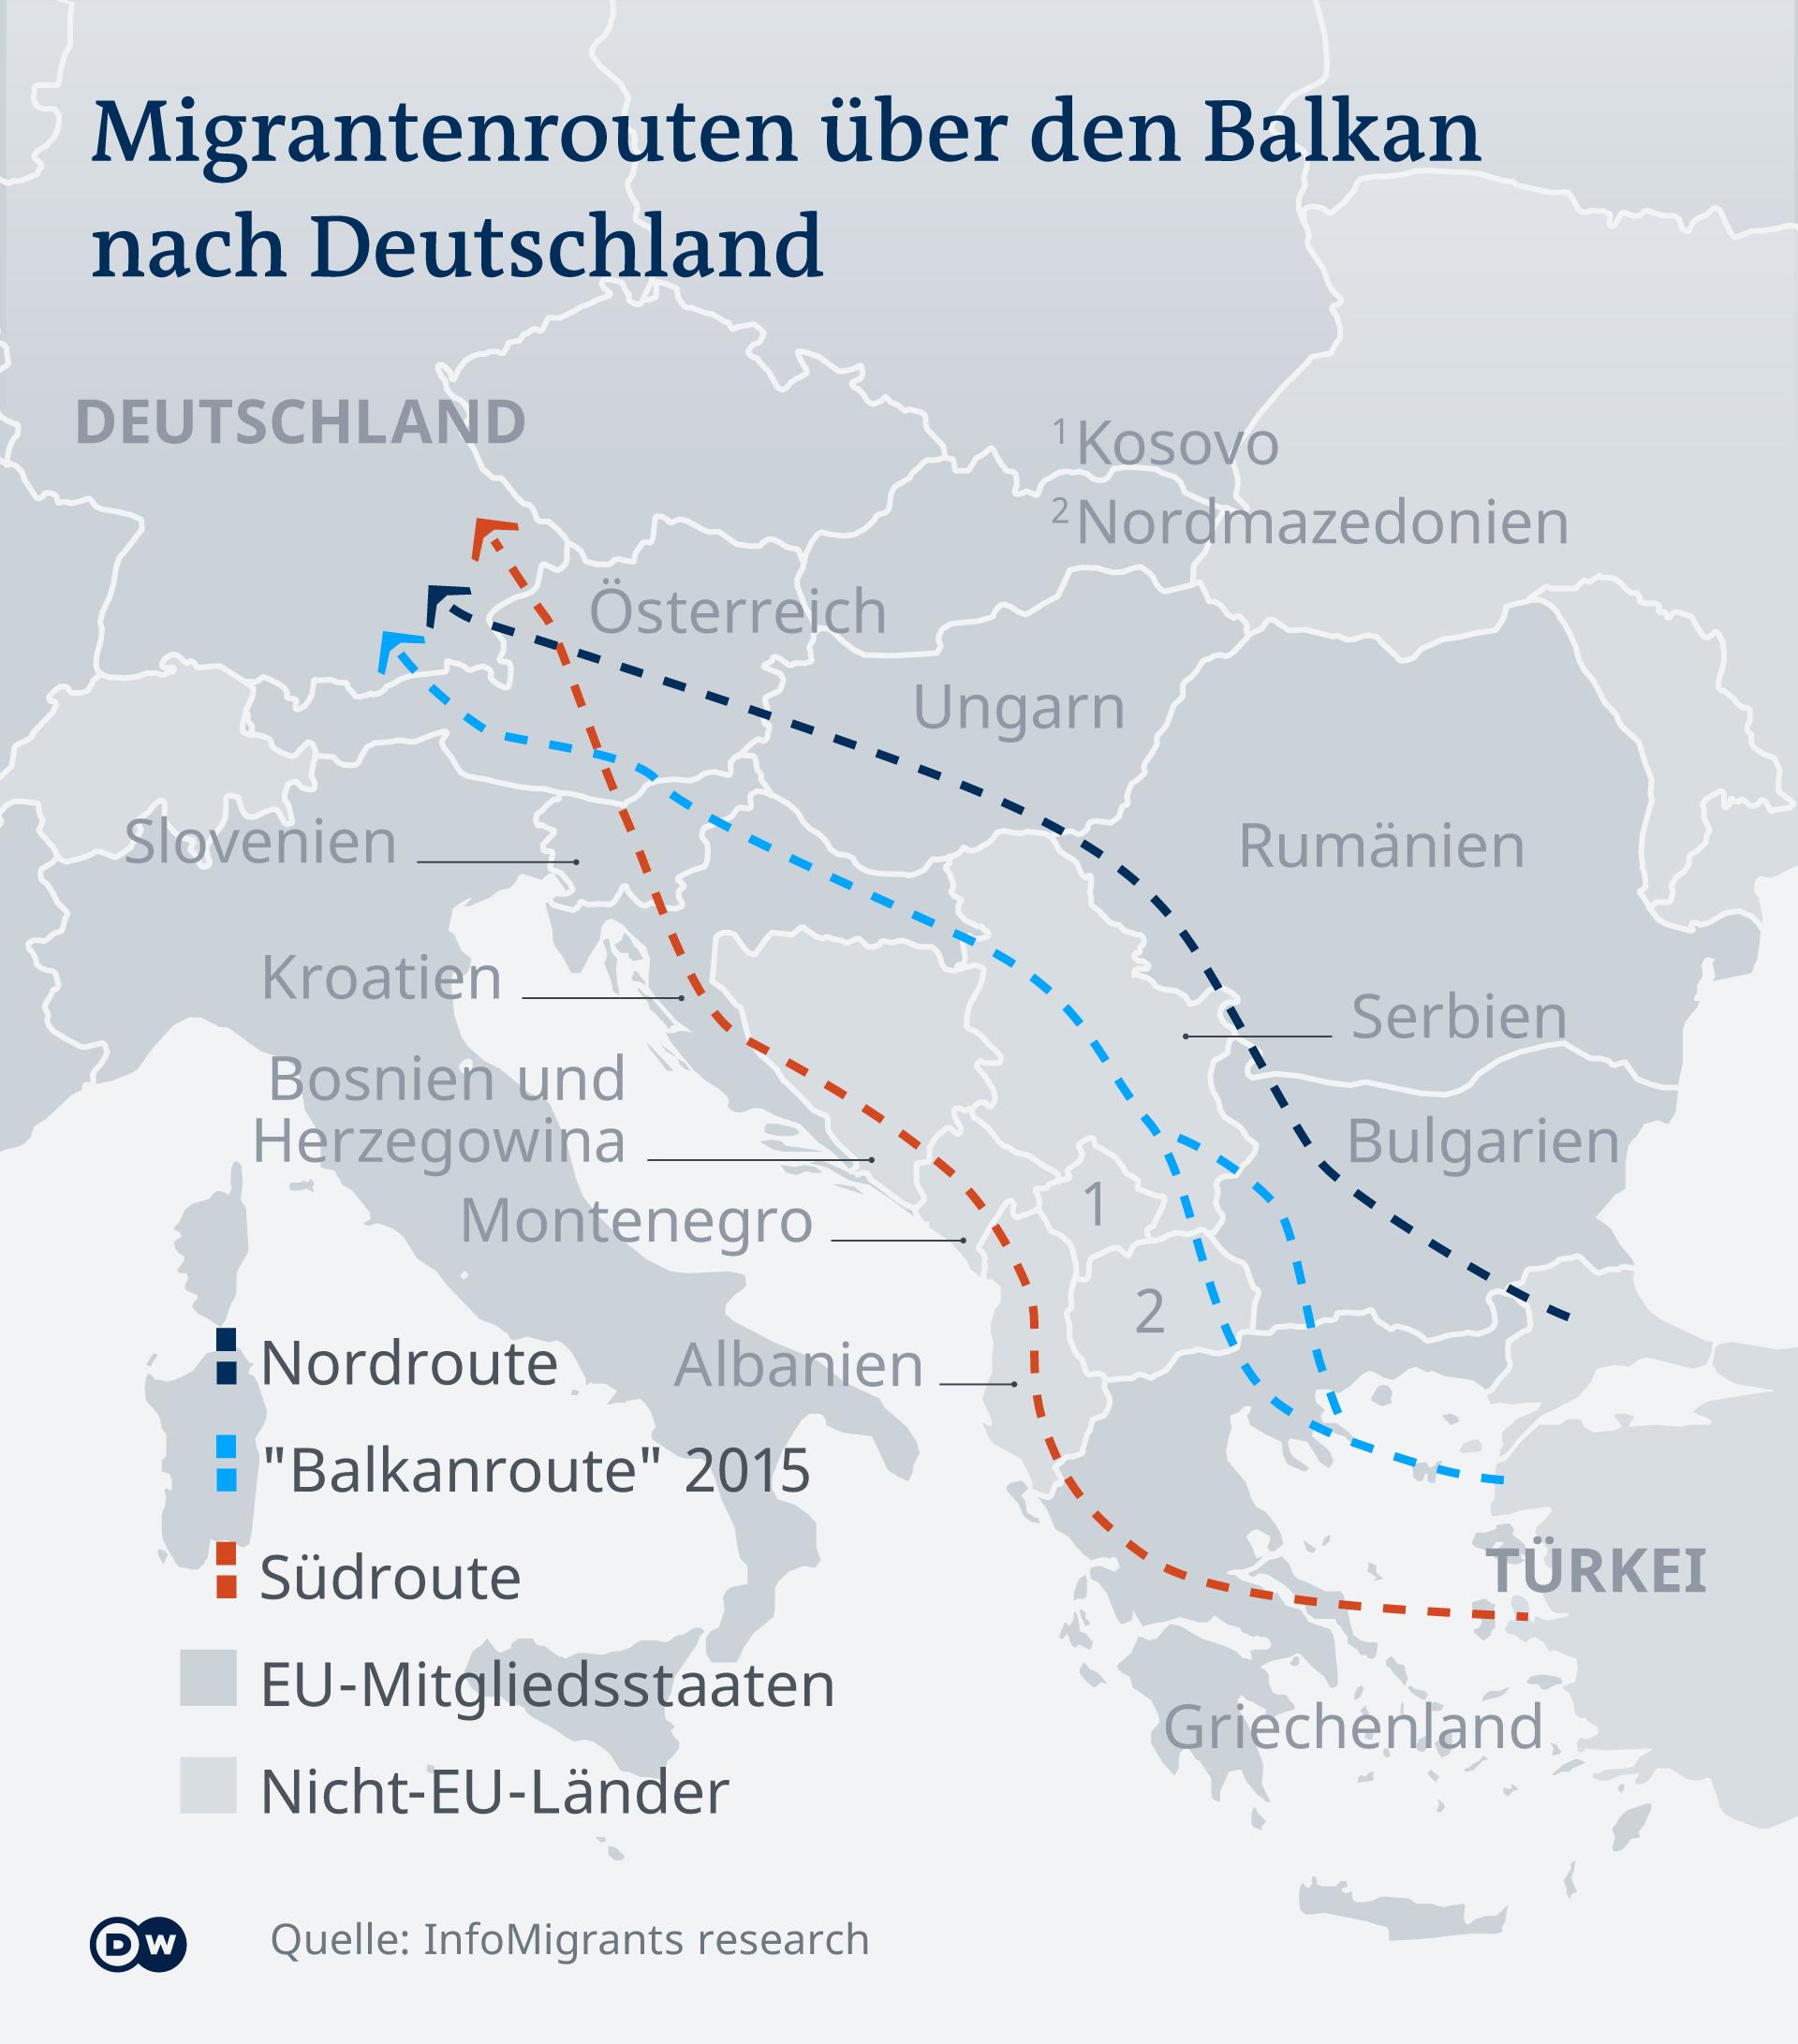 Infografik Migrantenrouten über den Balkan nach Deutschland DE